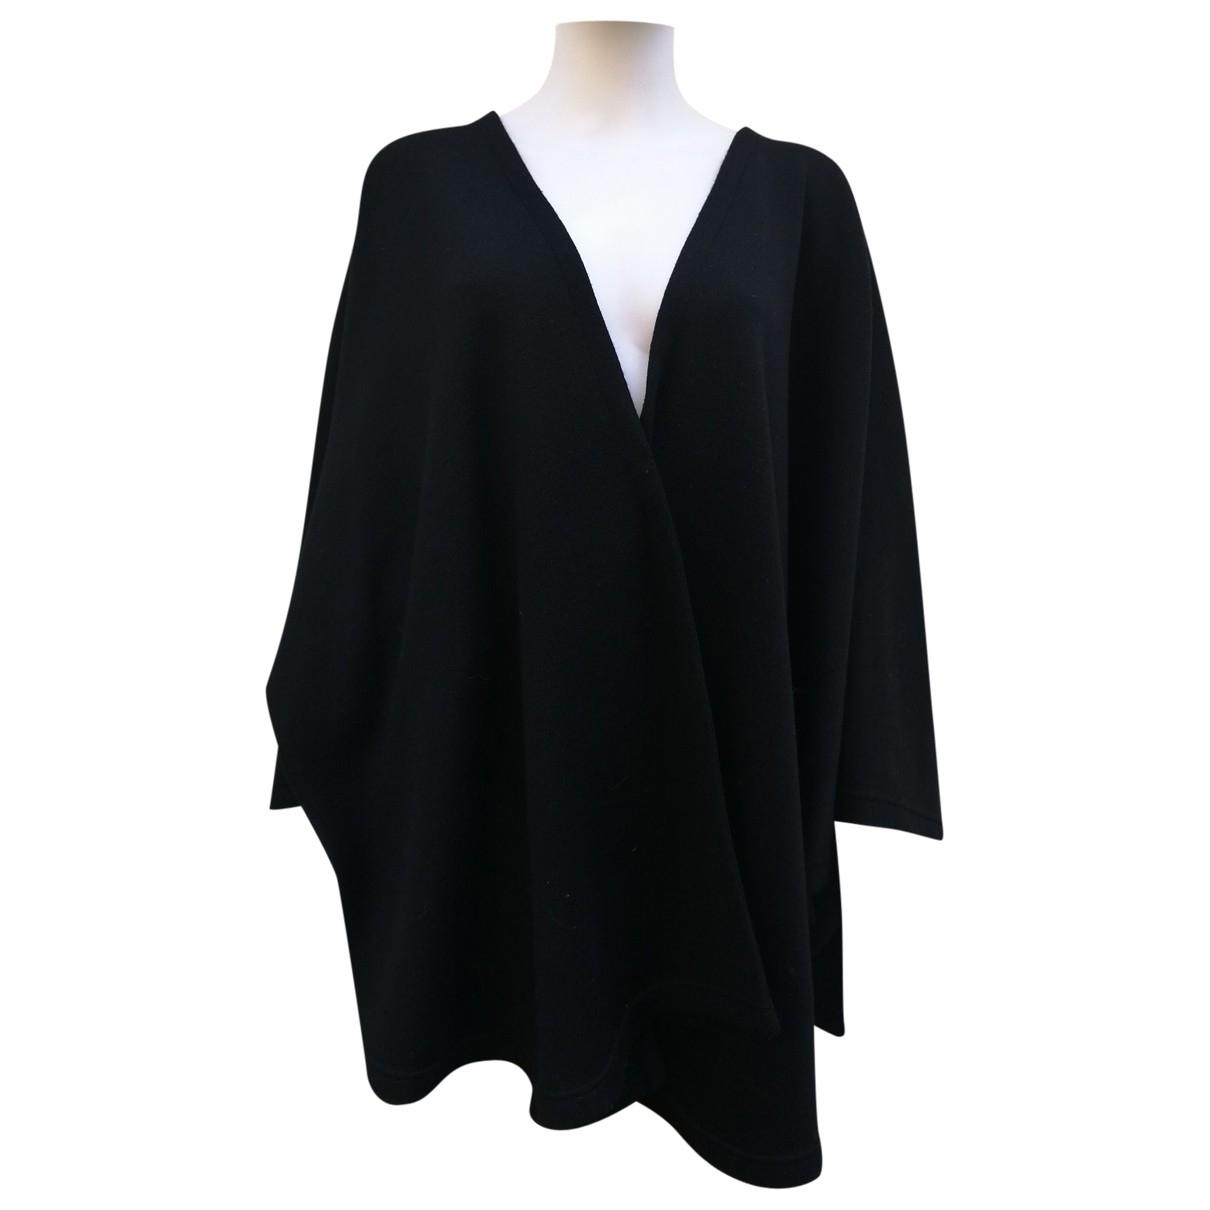 Bonpoint \N Black Wool jacket for Women One Size FR